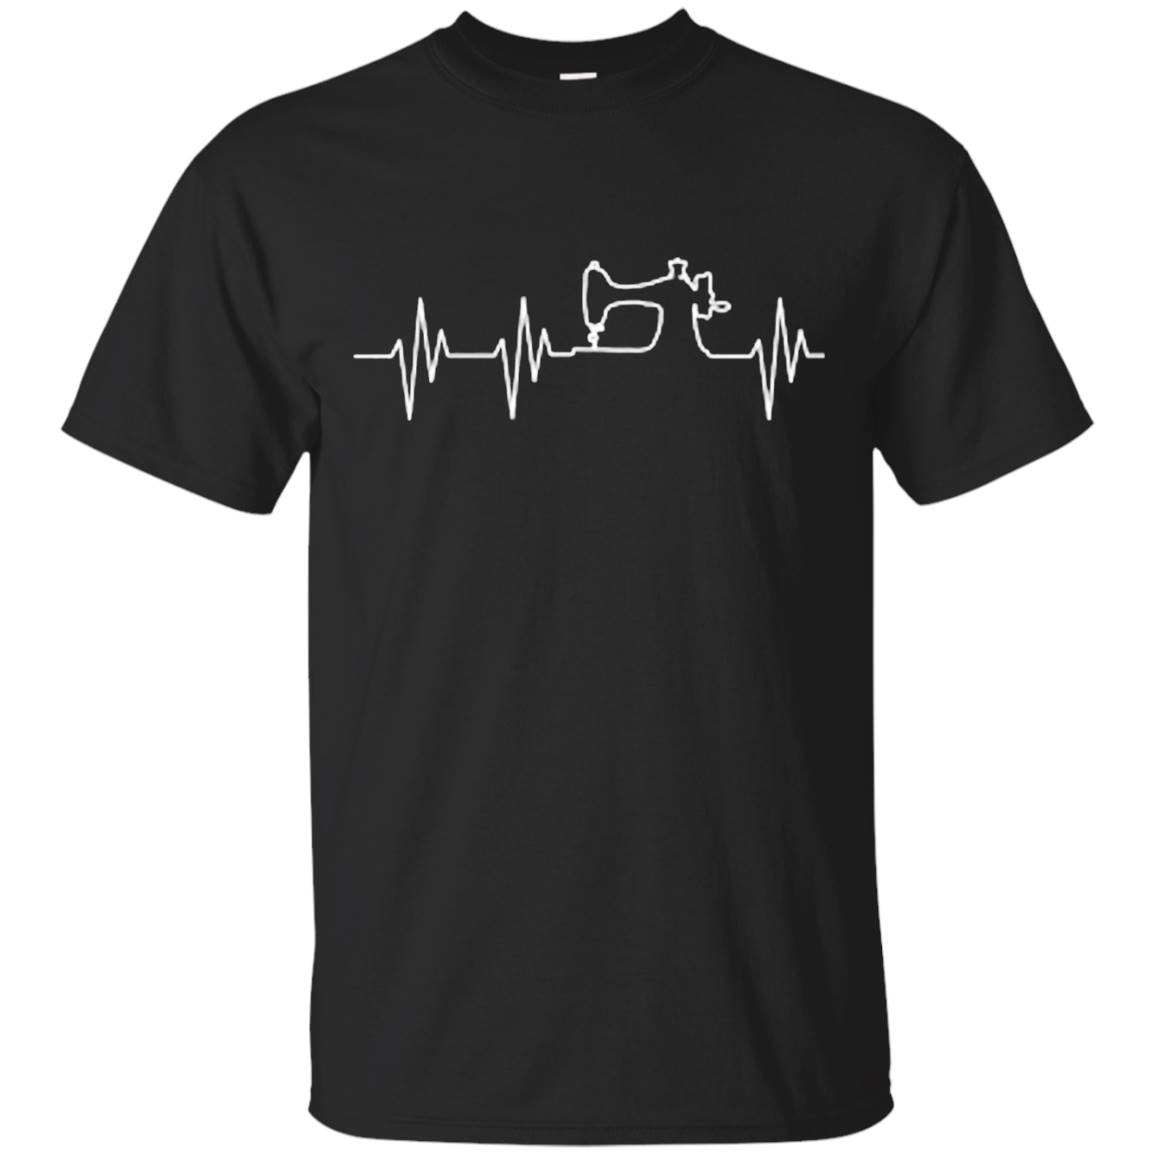 Sewing Machine Heartbeat T-Shirt Crafting Needle